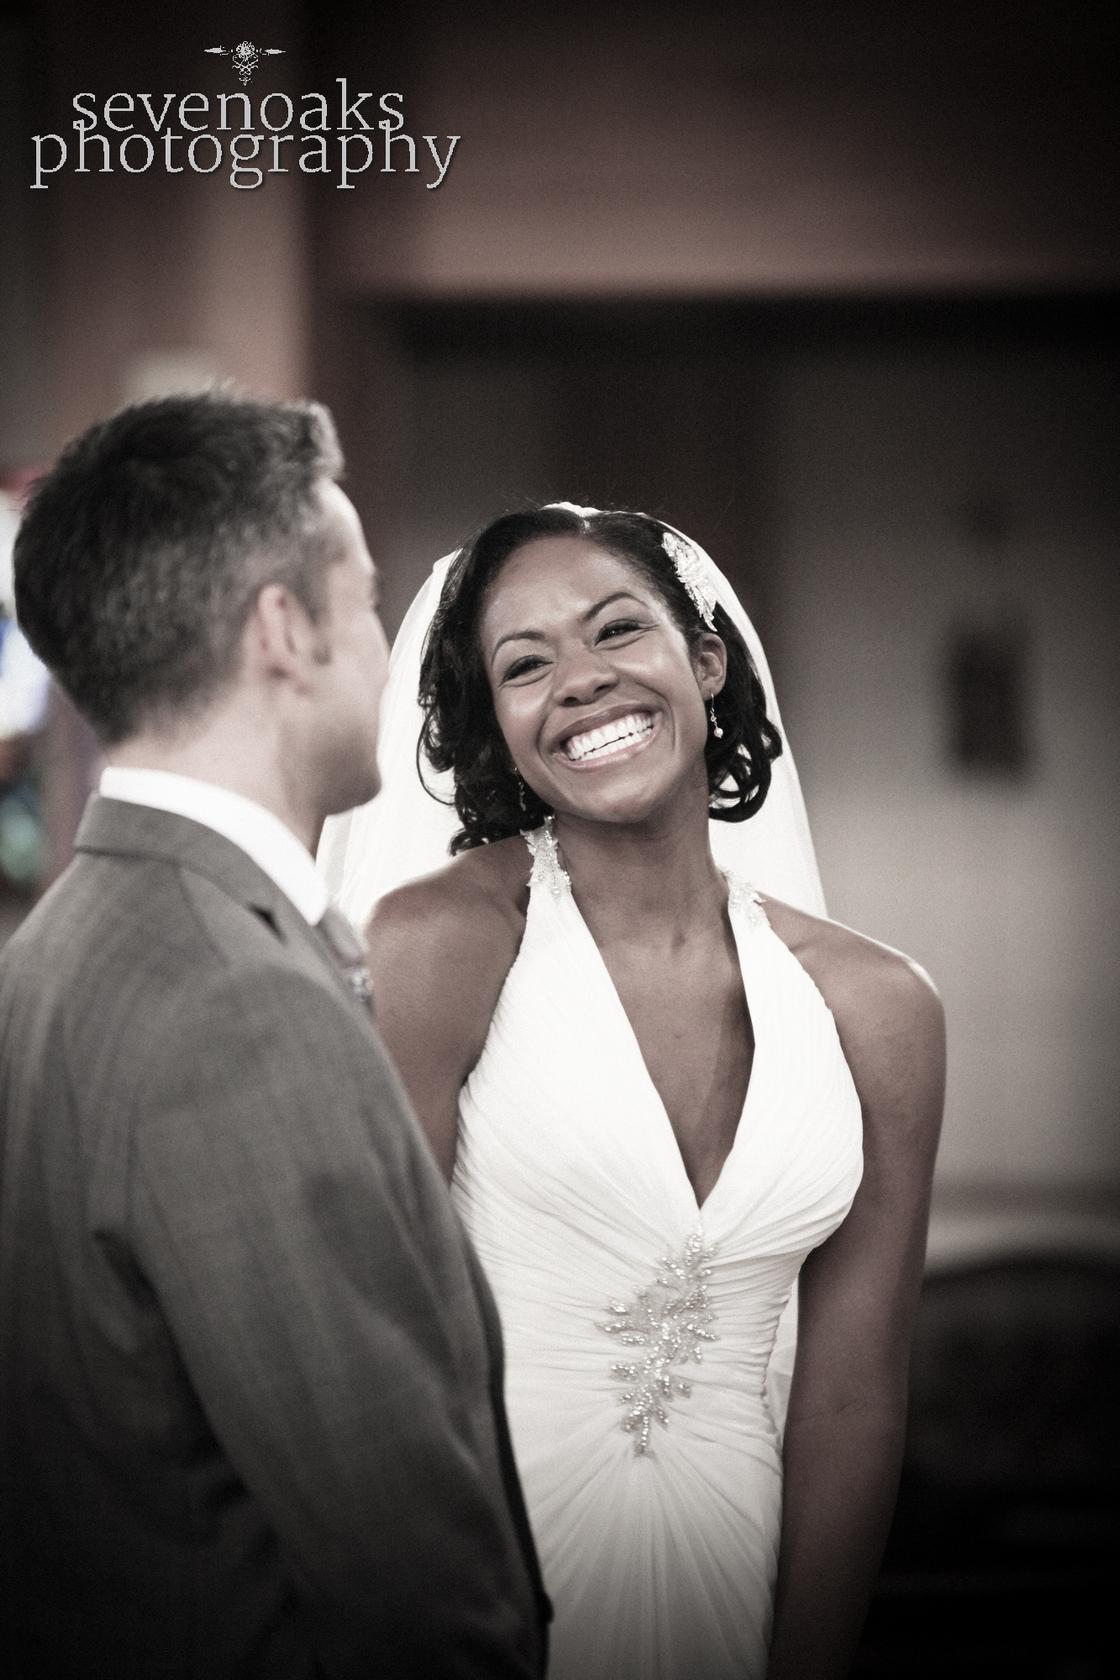 Sevenoaks documentary wedding photographer-11.jpg